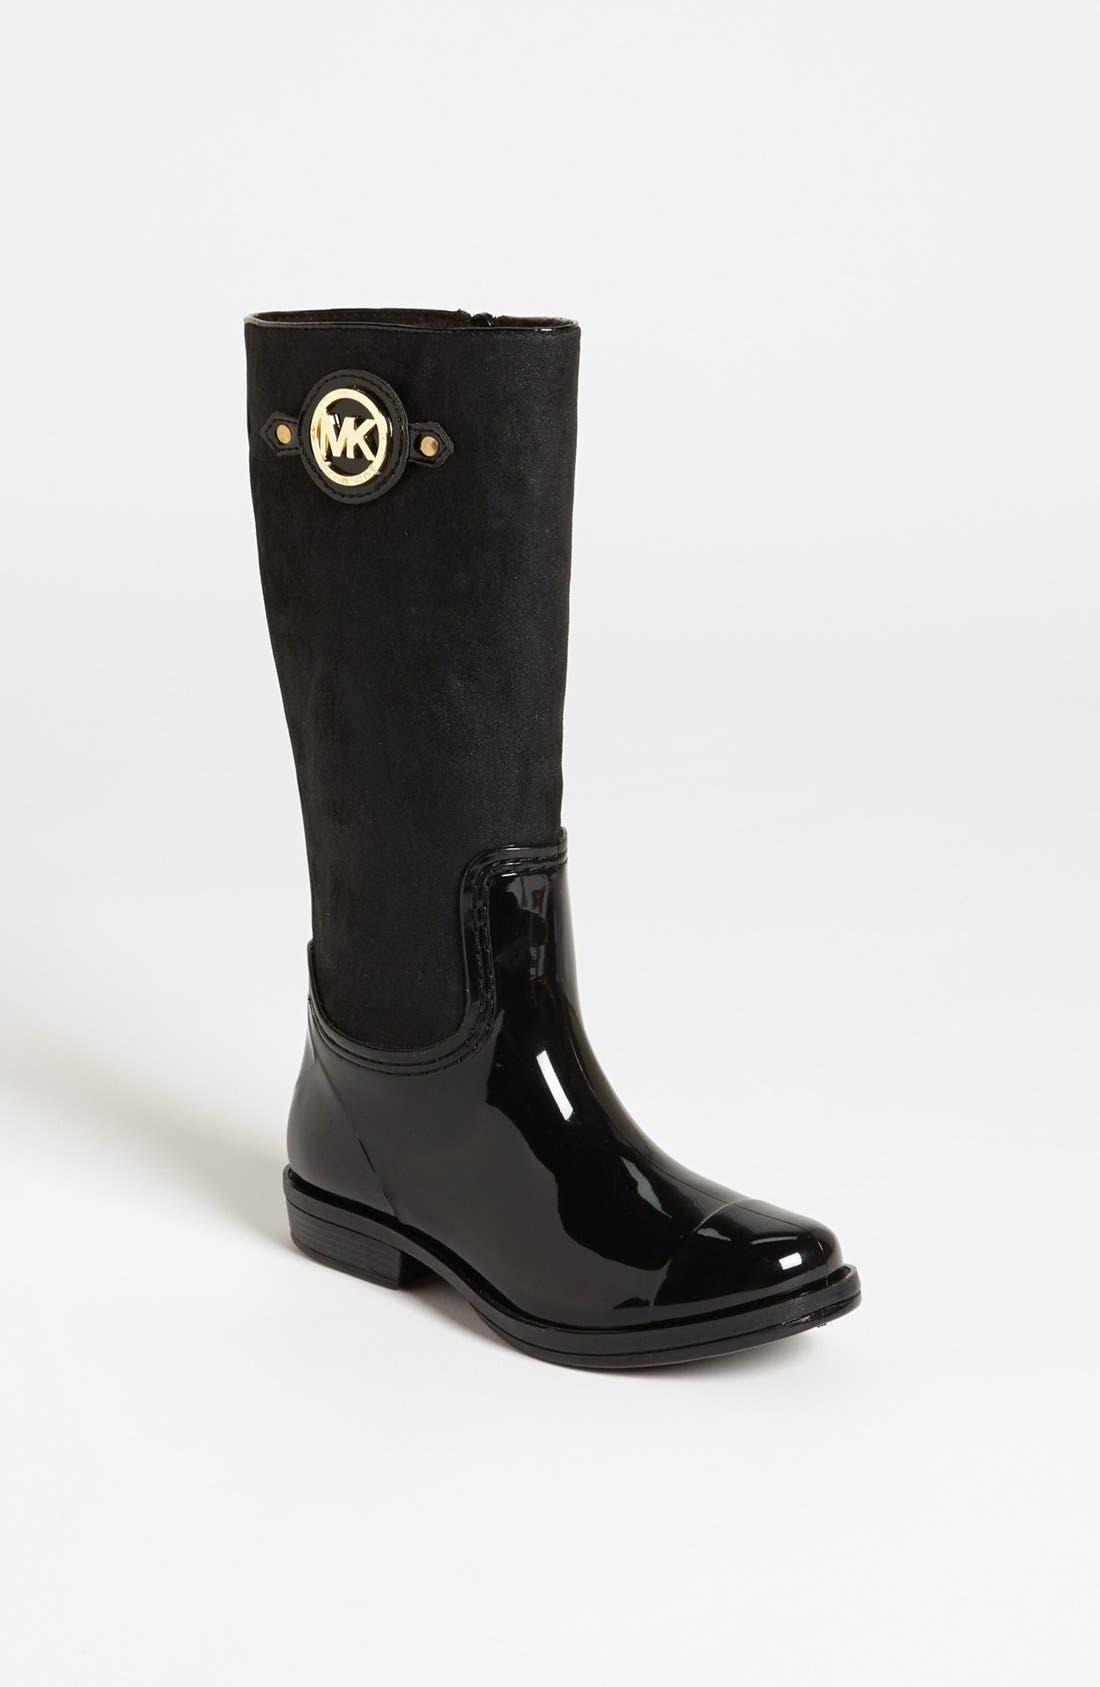 Alternate Image 1 Selected - MICHAEL Michael Kors 'Daisy' Rain Boot (Little Kid & Big Kid)